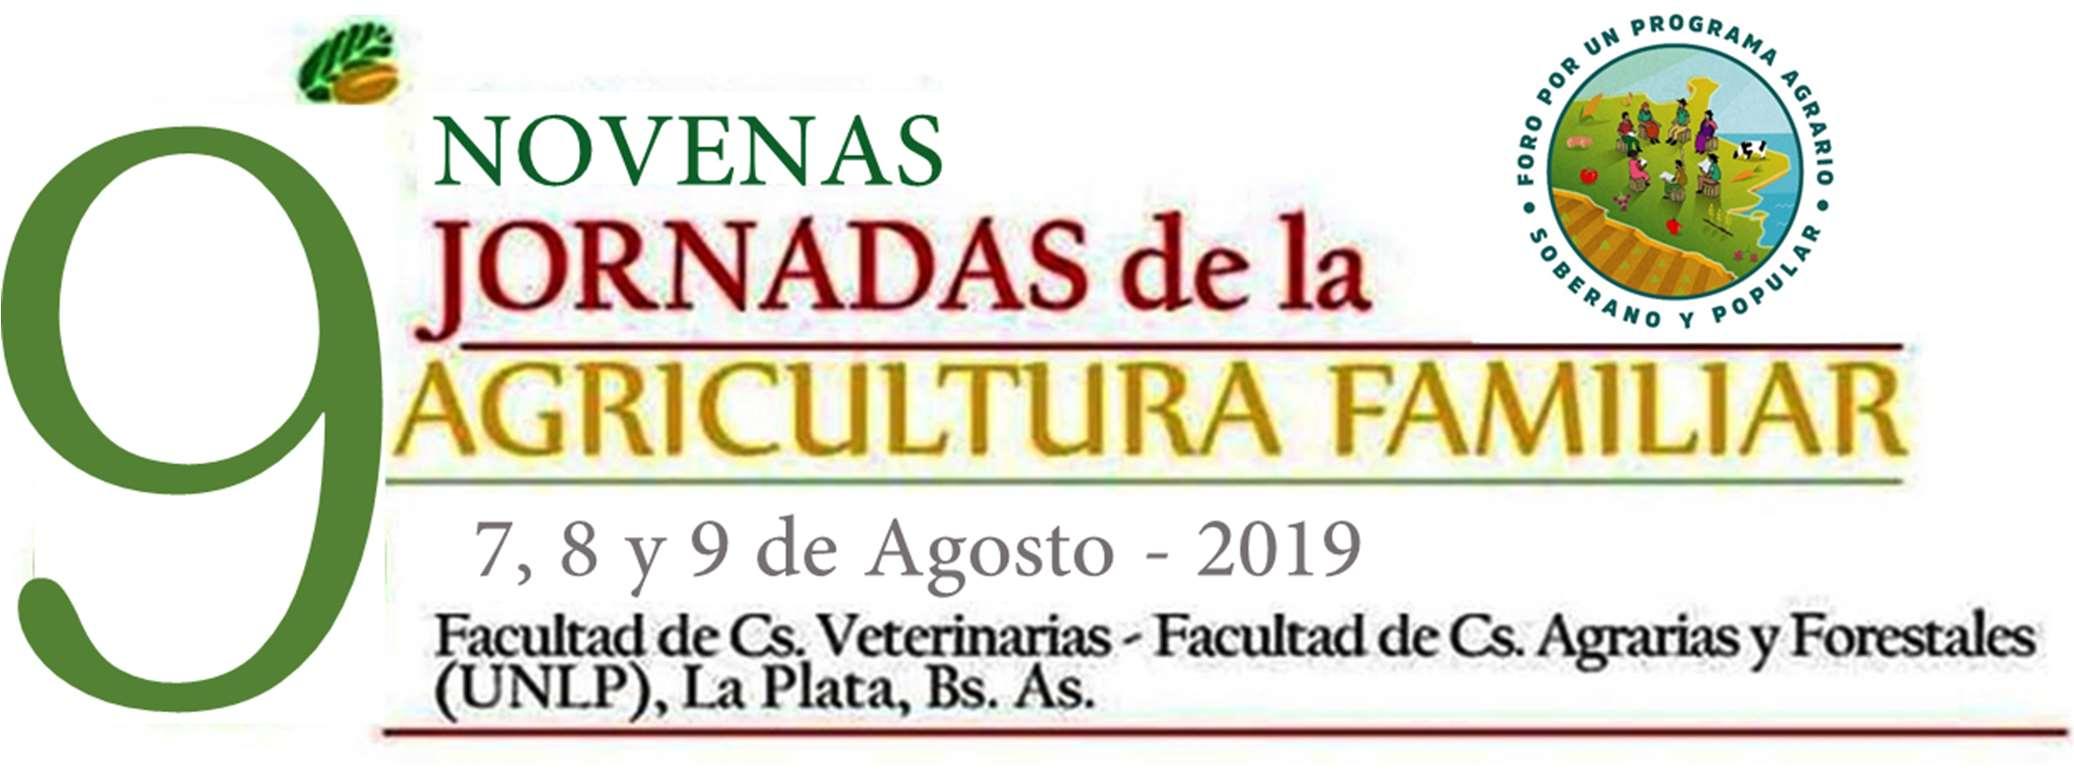 9nas Jornadas de la Agricultura Familiar